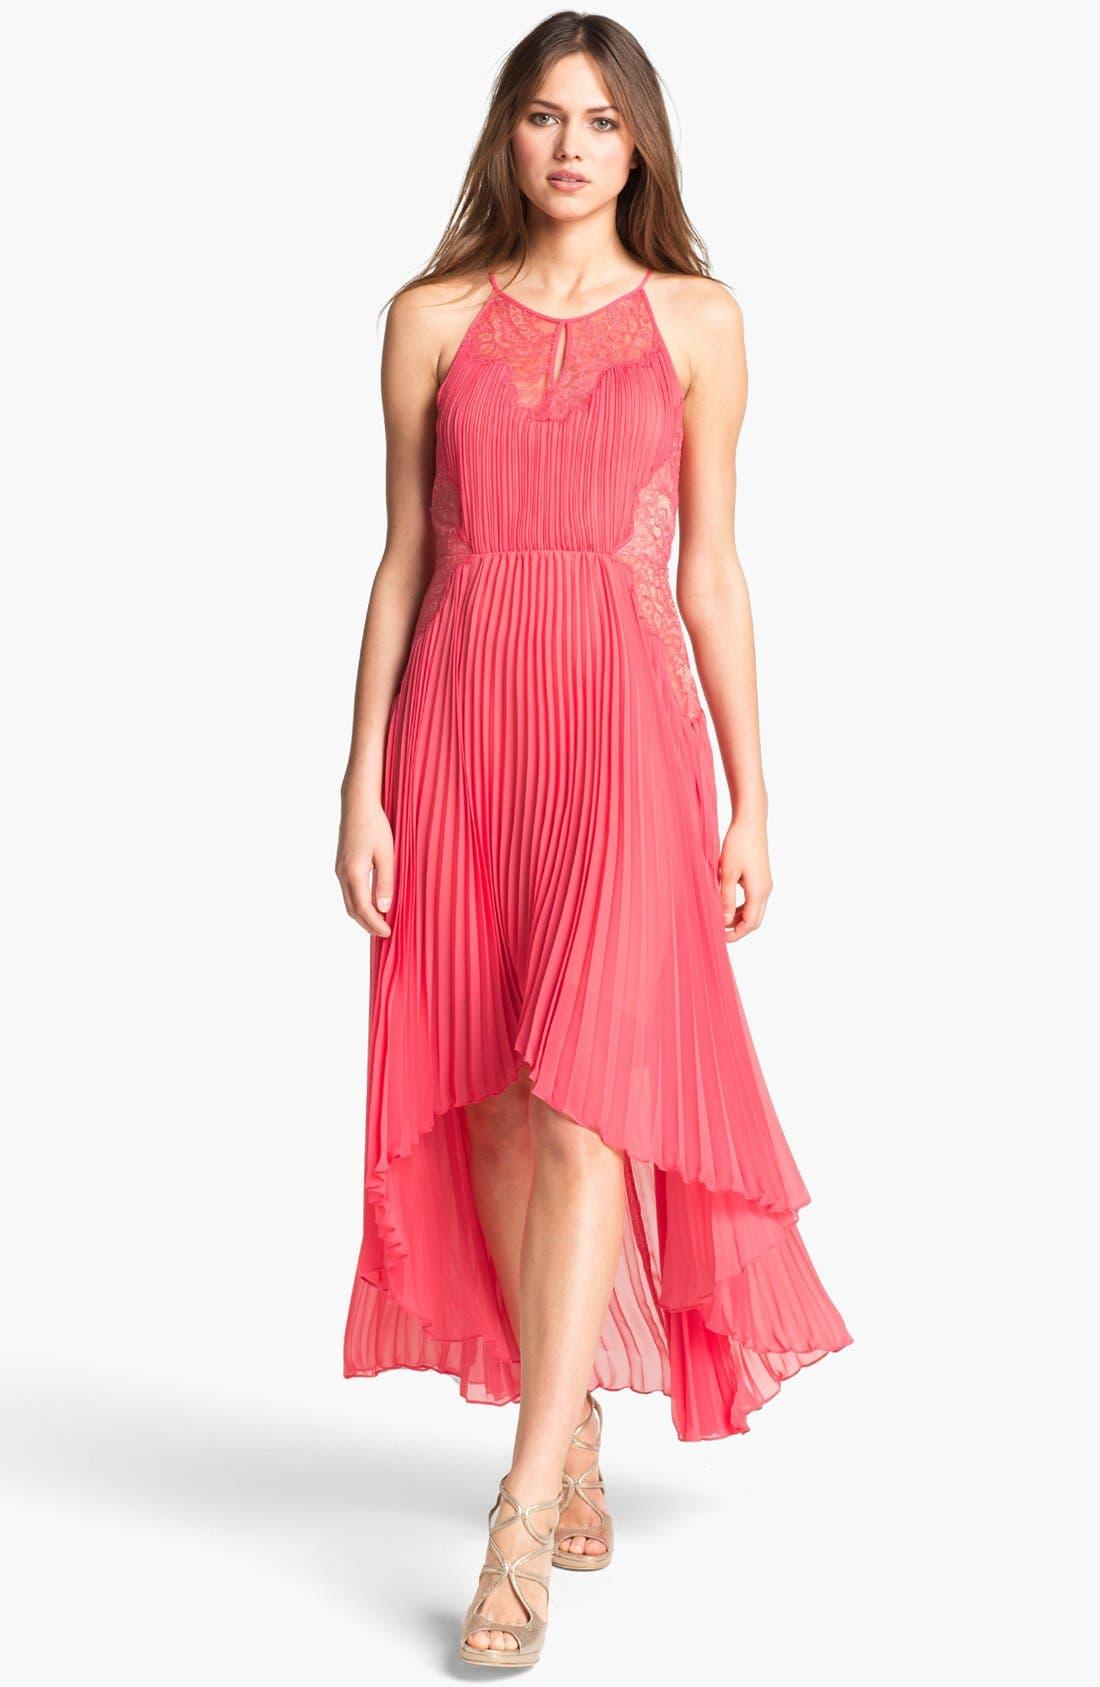 Alternate Image 1 Selected - BCBGMAXAZRIA Pleated Lace & Chiffon High/Low Dress